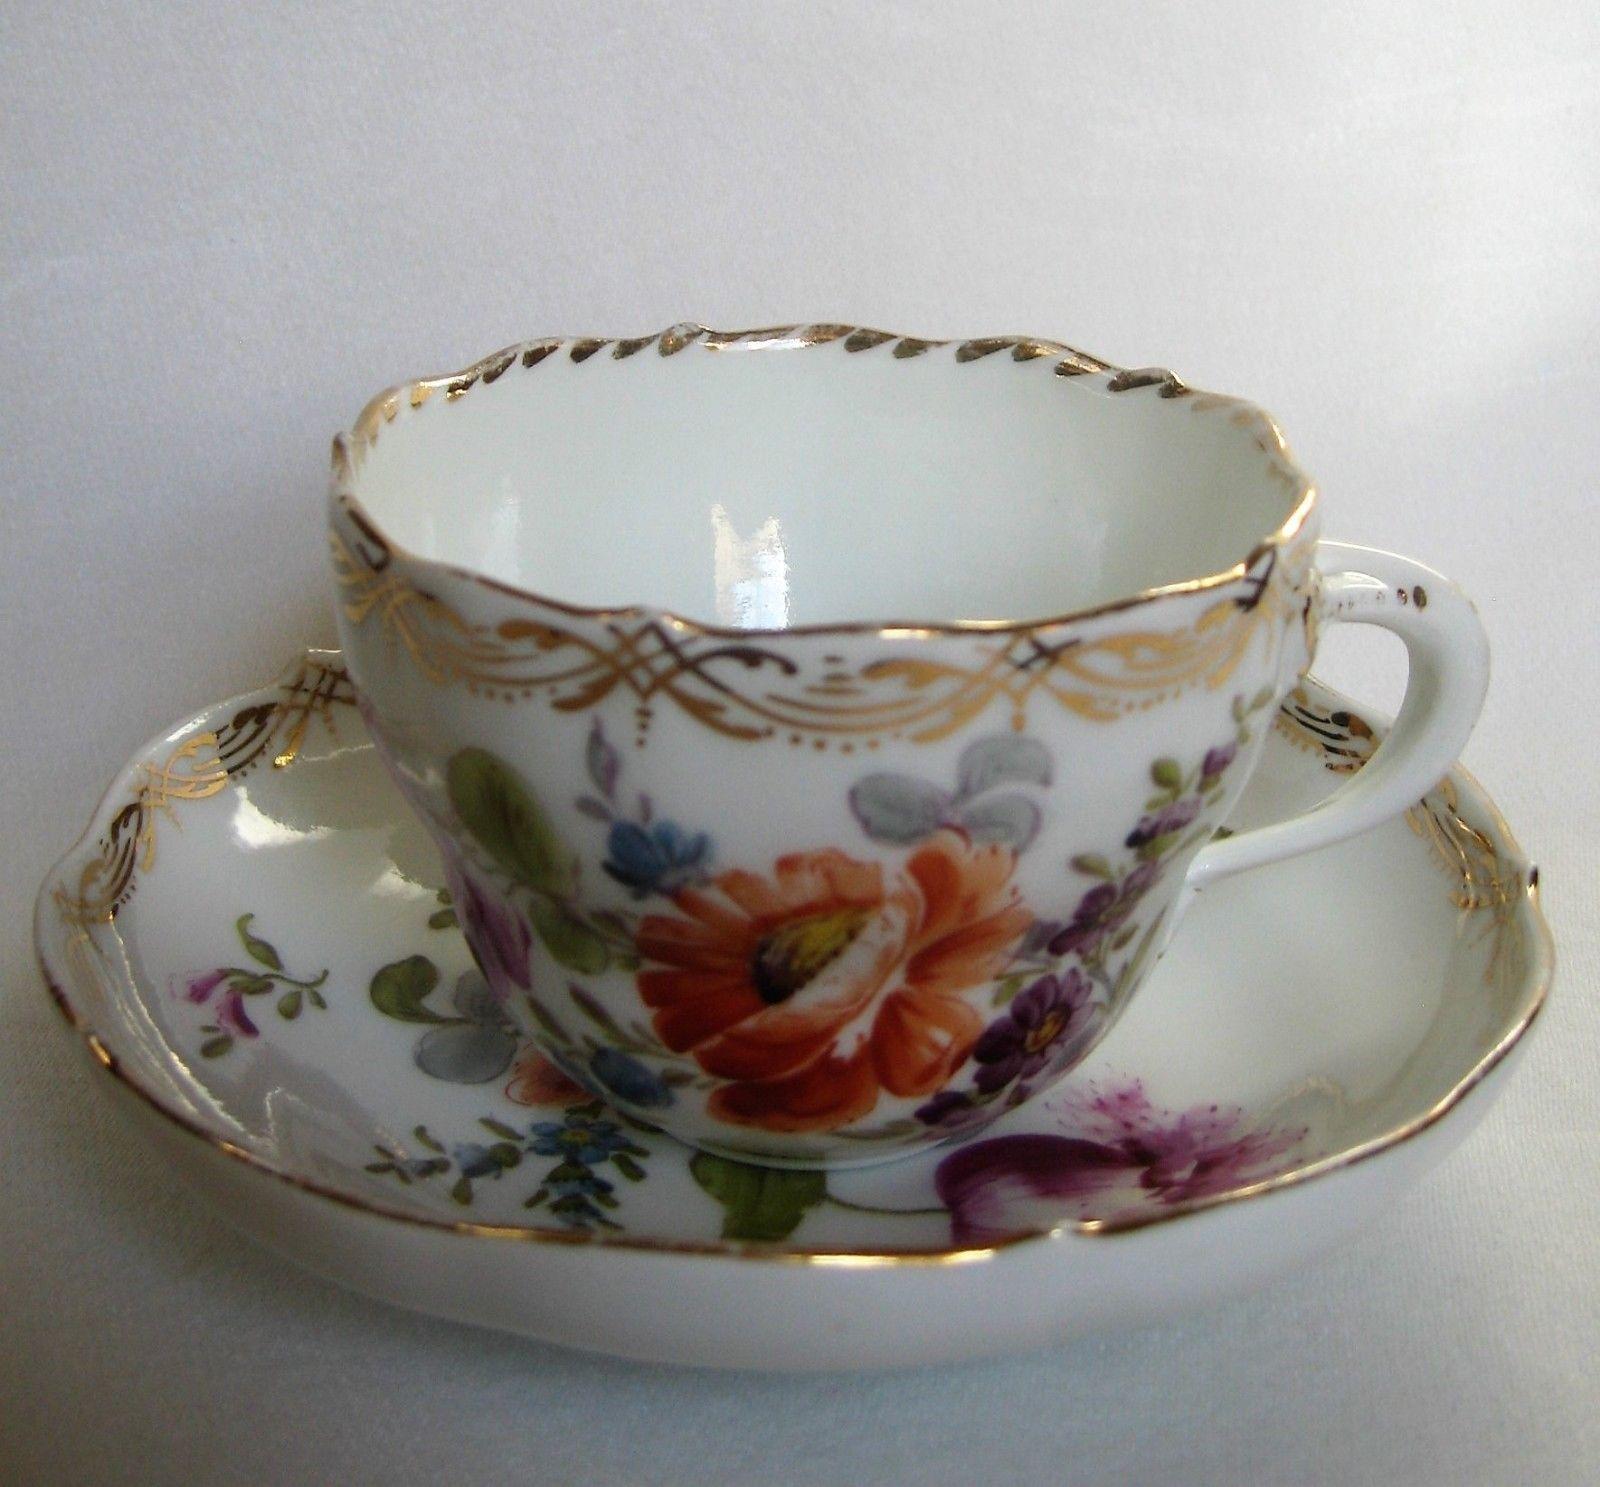 Antique Meissen Porcelain Hand Painted Demitasse Cups